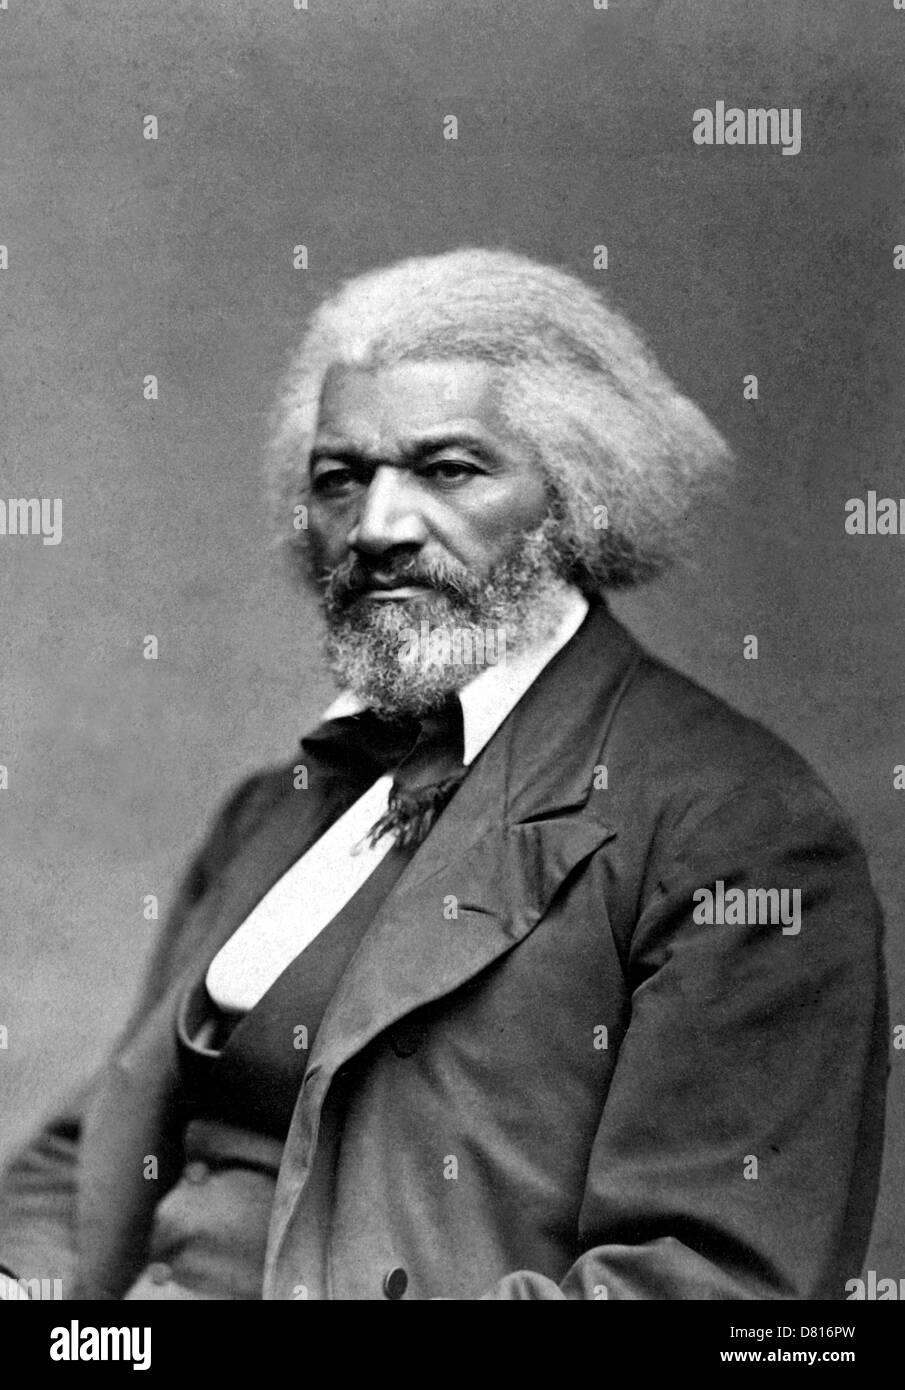 Frederick Douglass, American social reformer, orator, writer and statesman - Stock Image